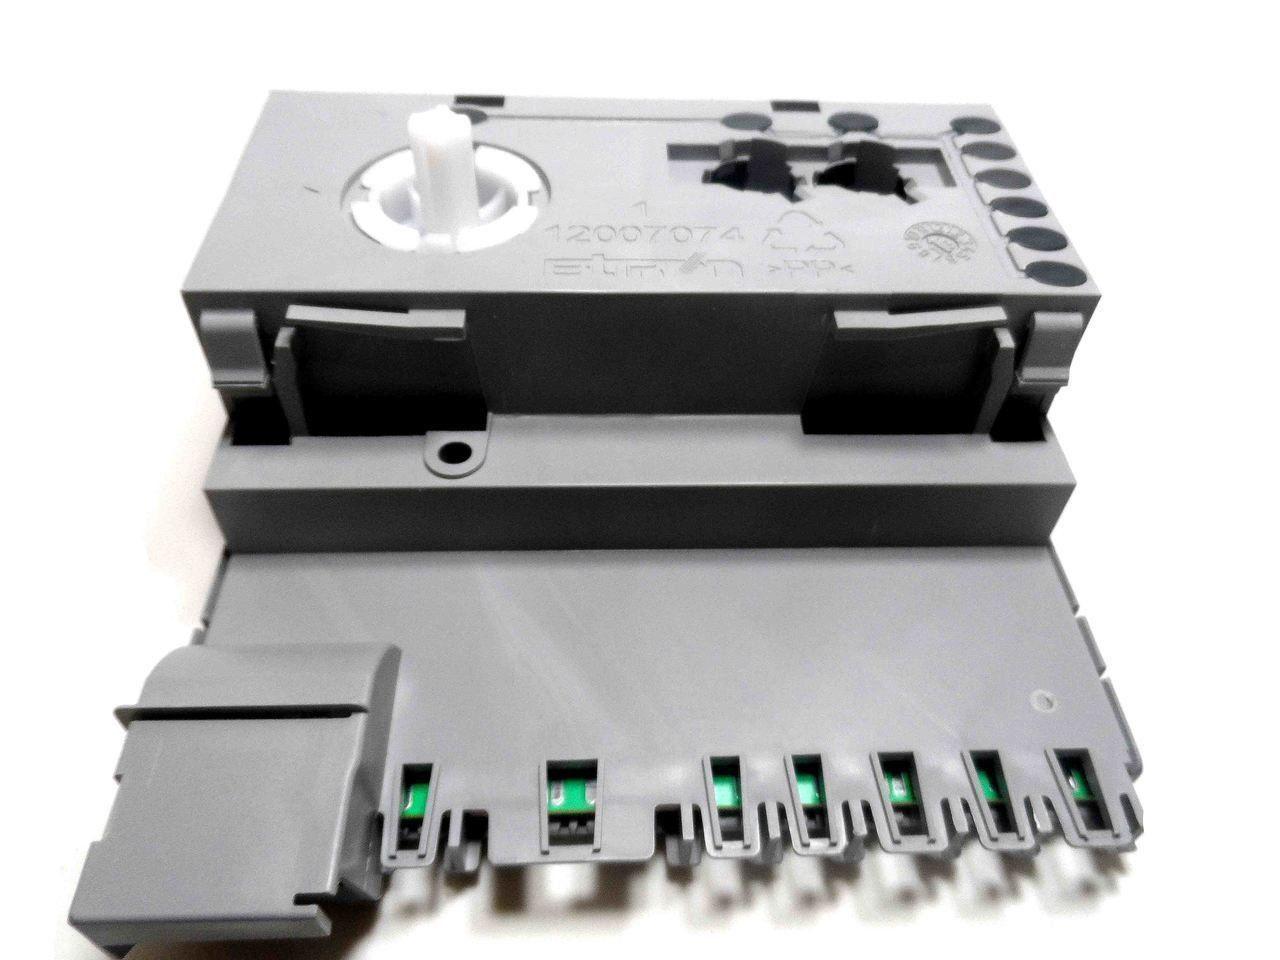 Placa Eletrônica Lava Louça Electrolux 220V